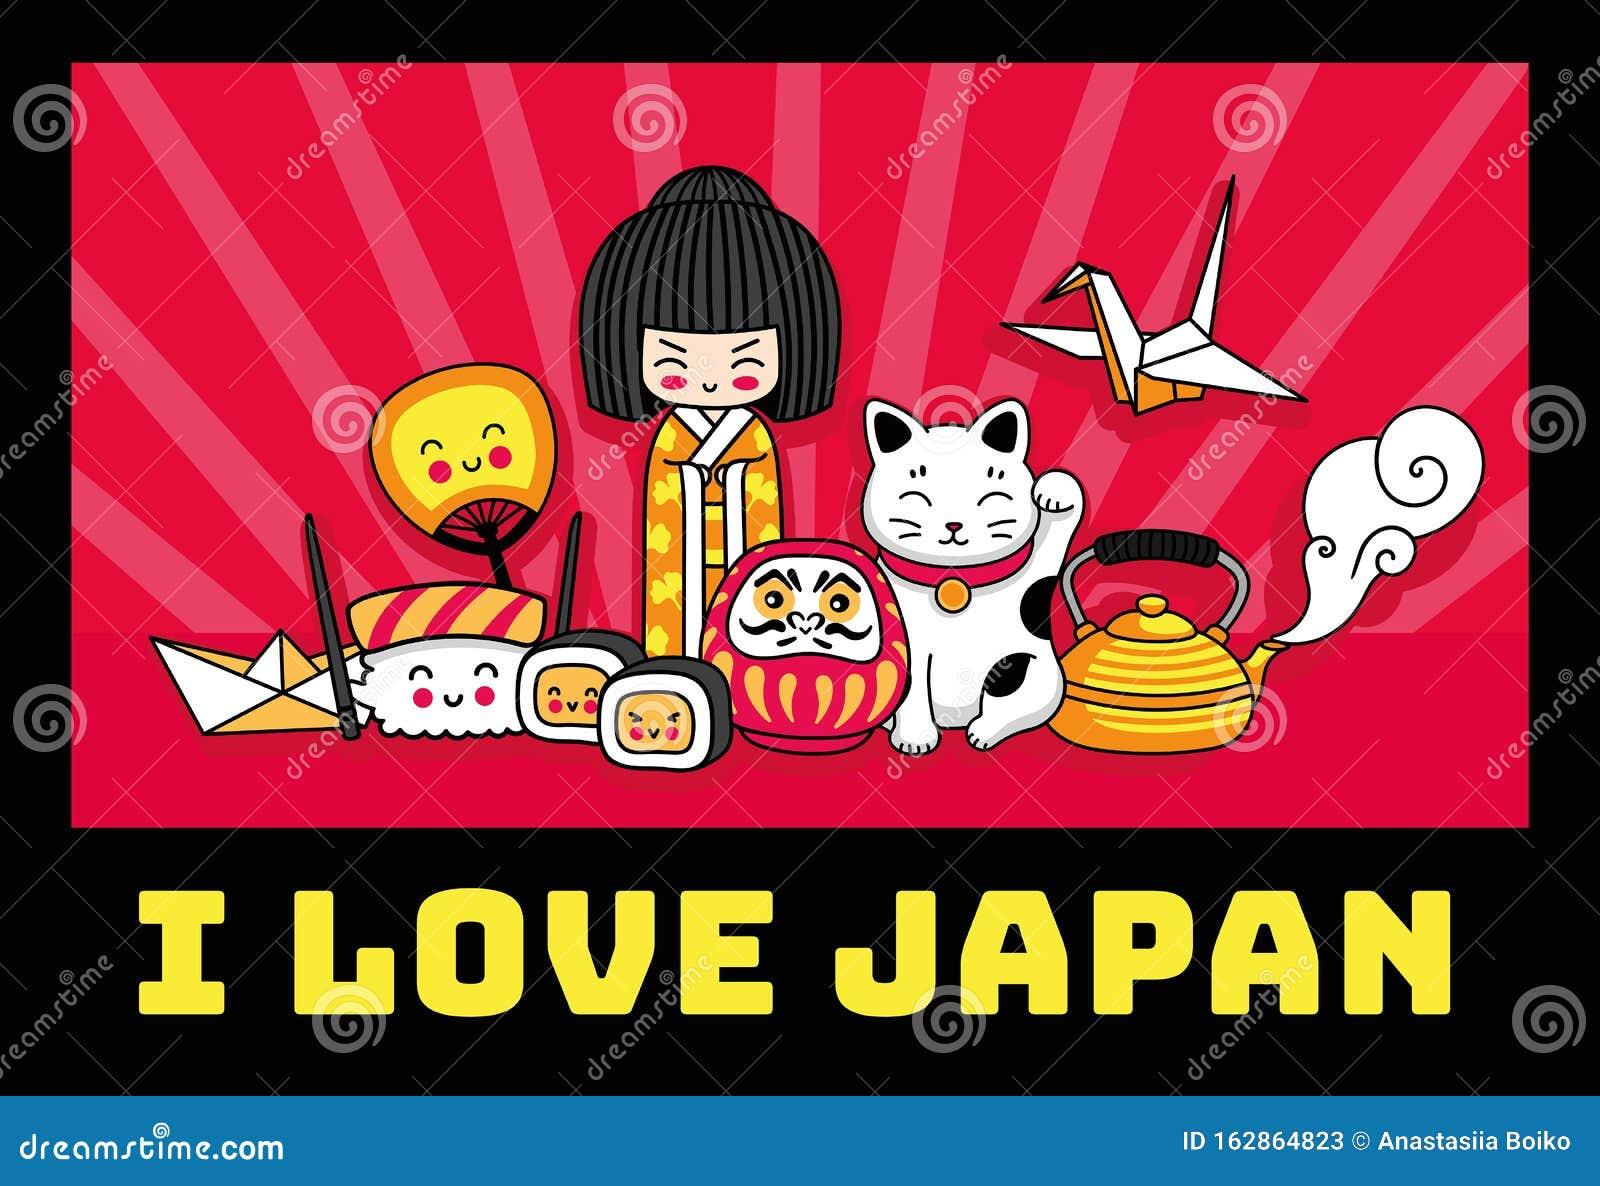 Moving Arm Lucky Cat (Maneki Neko) V2 Free Paper Toy Download | 1185x1600